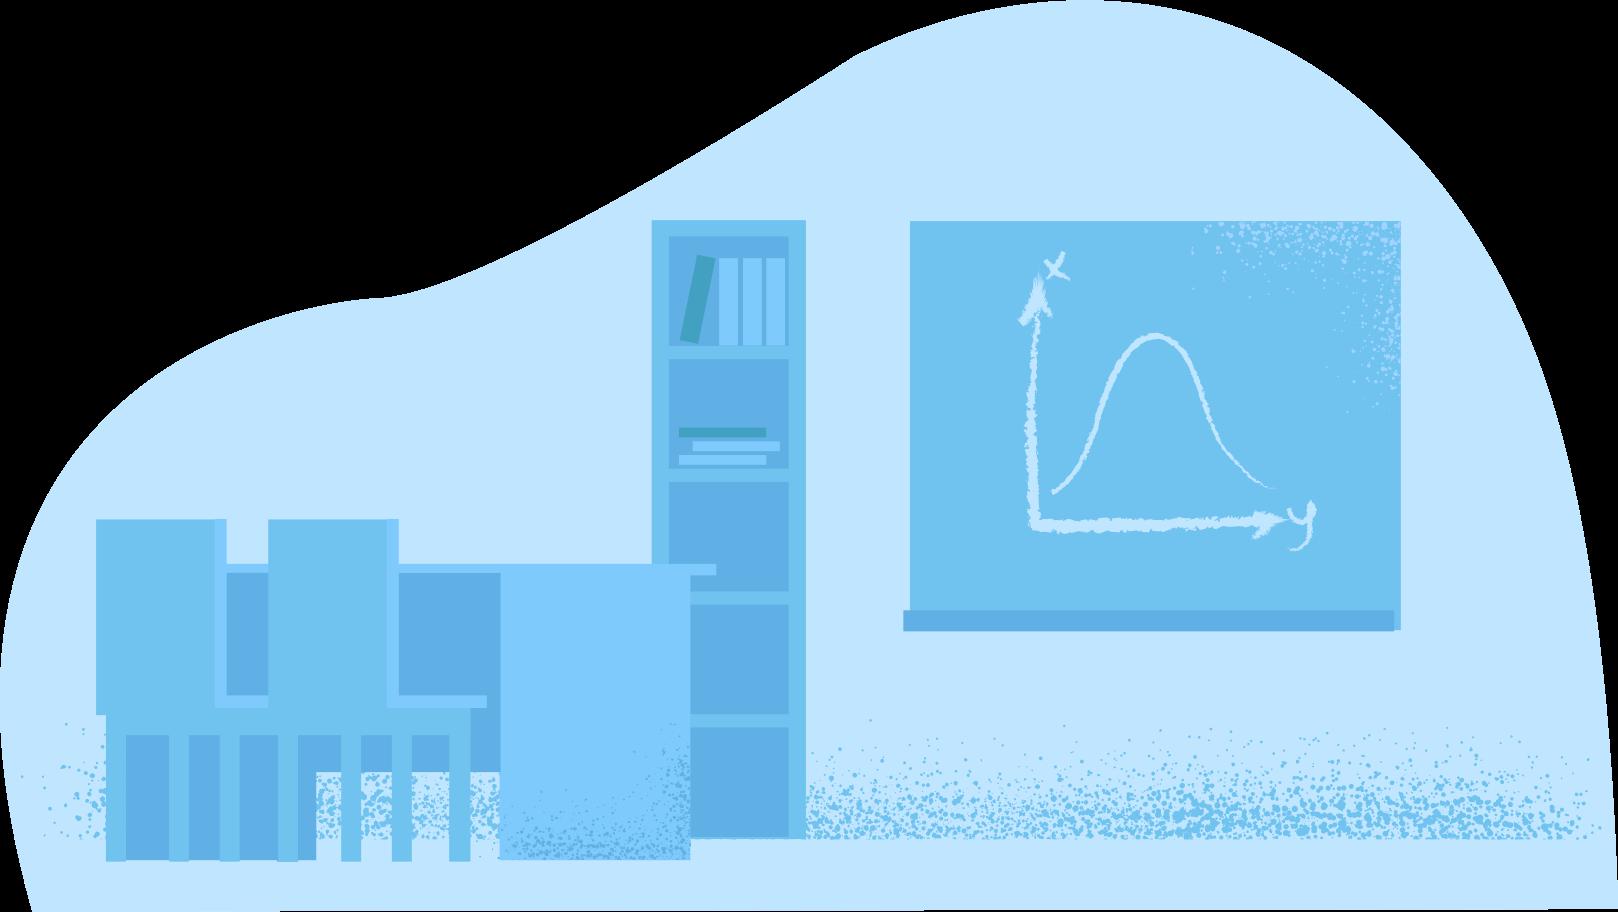 Vektorgrafik im  Stil klassenzimmer als PNG und SVG | Icons8 Grafiken